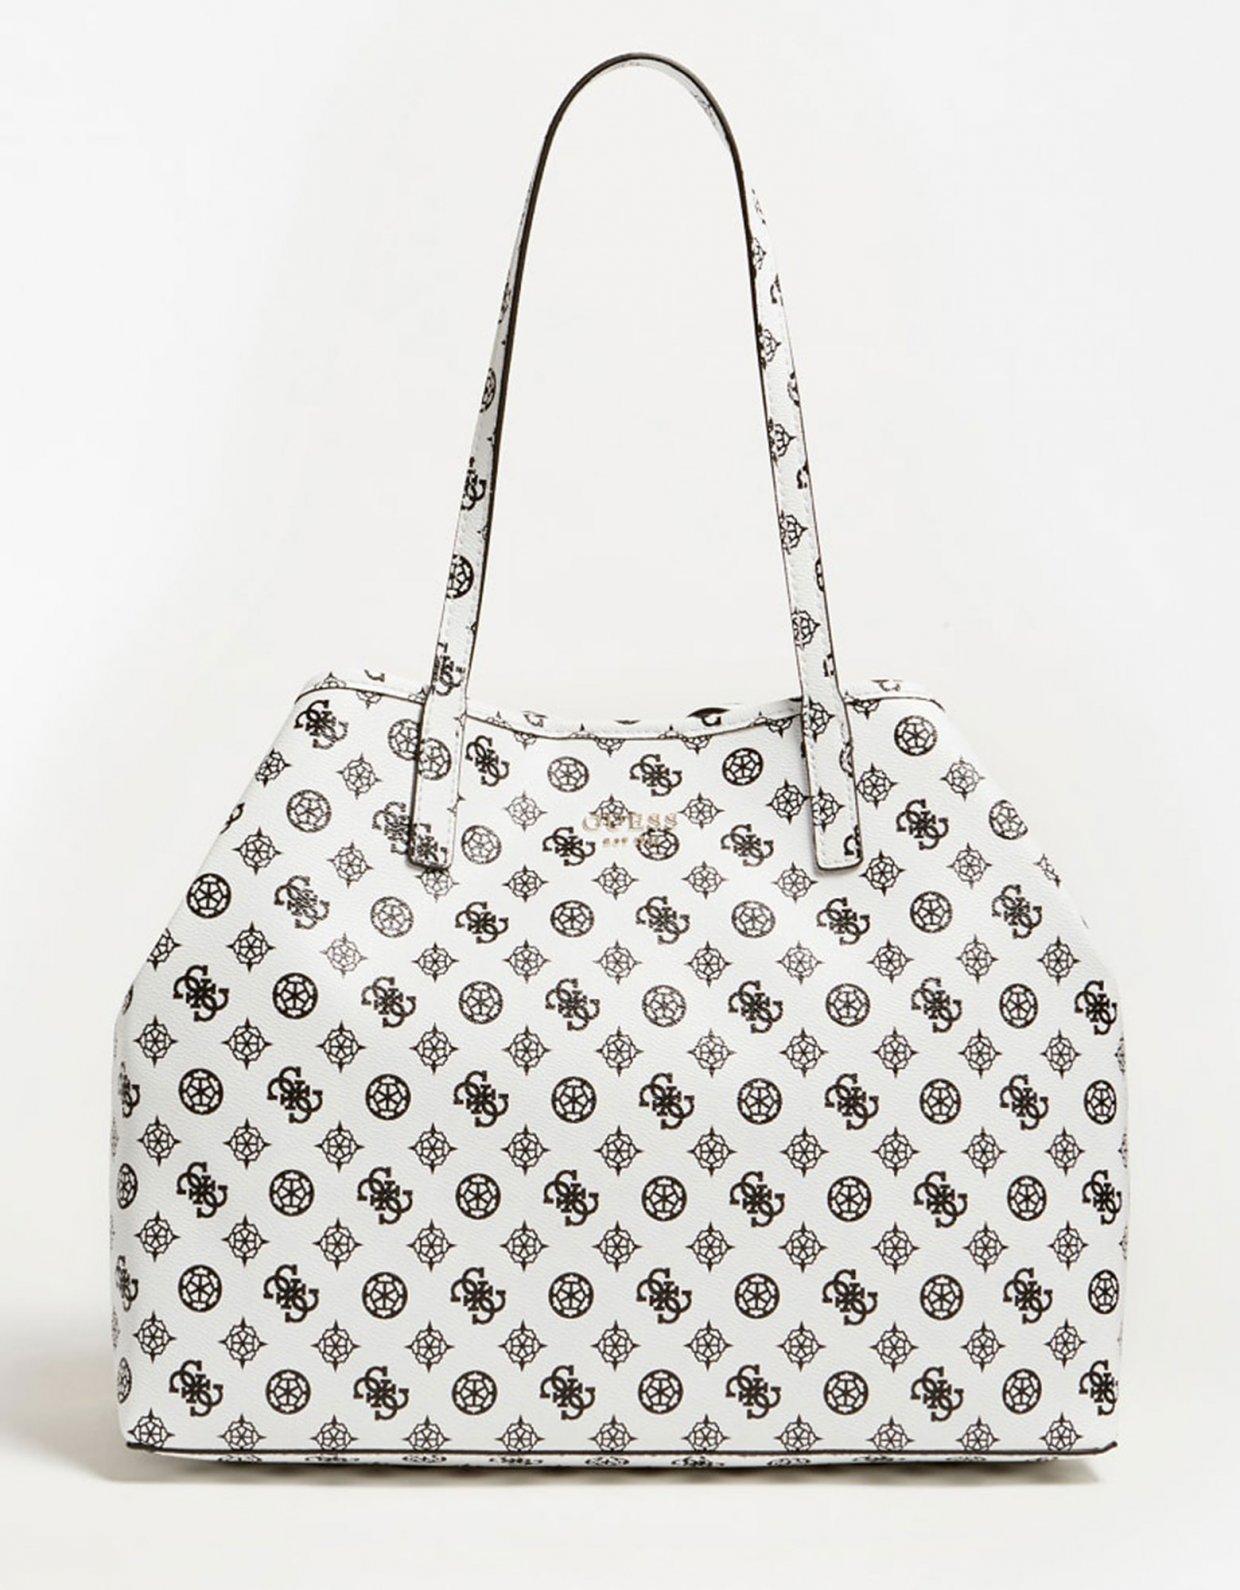 Guess Vikky large tote bag white